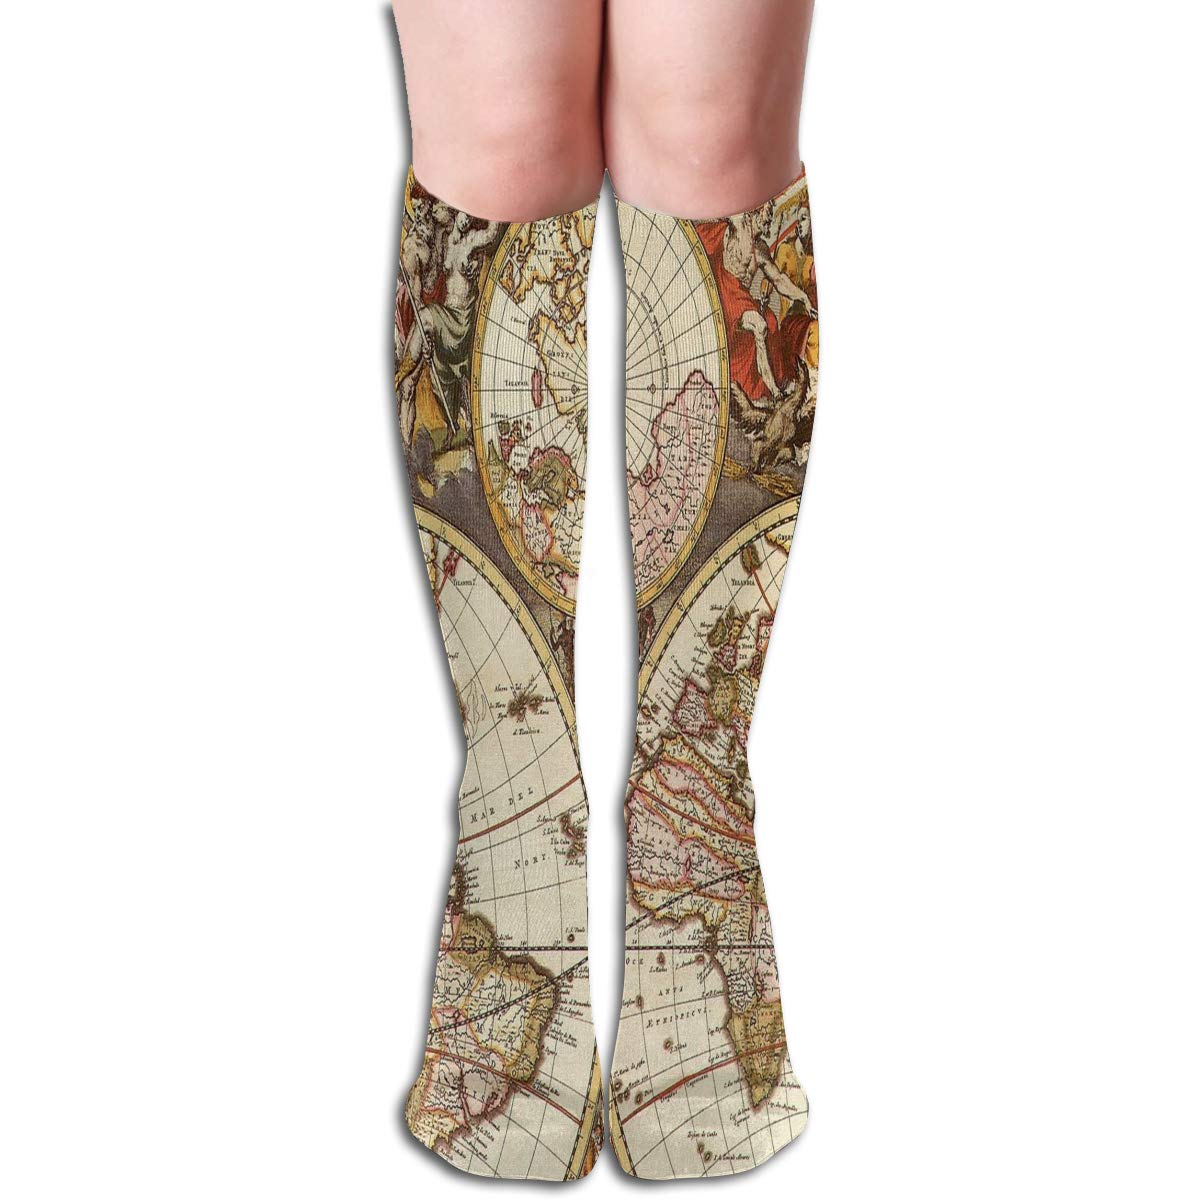 Girls Socks Over Knee Vintage Movie Clapboard Tape Winter Custom Personalized